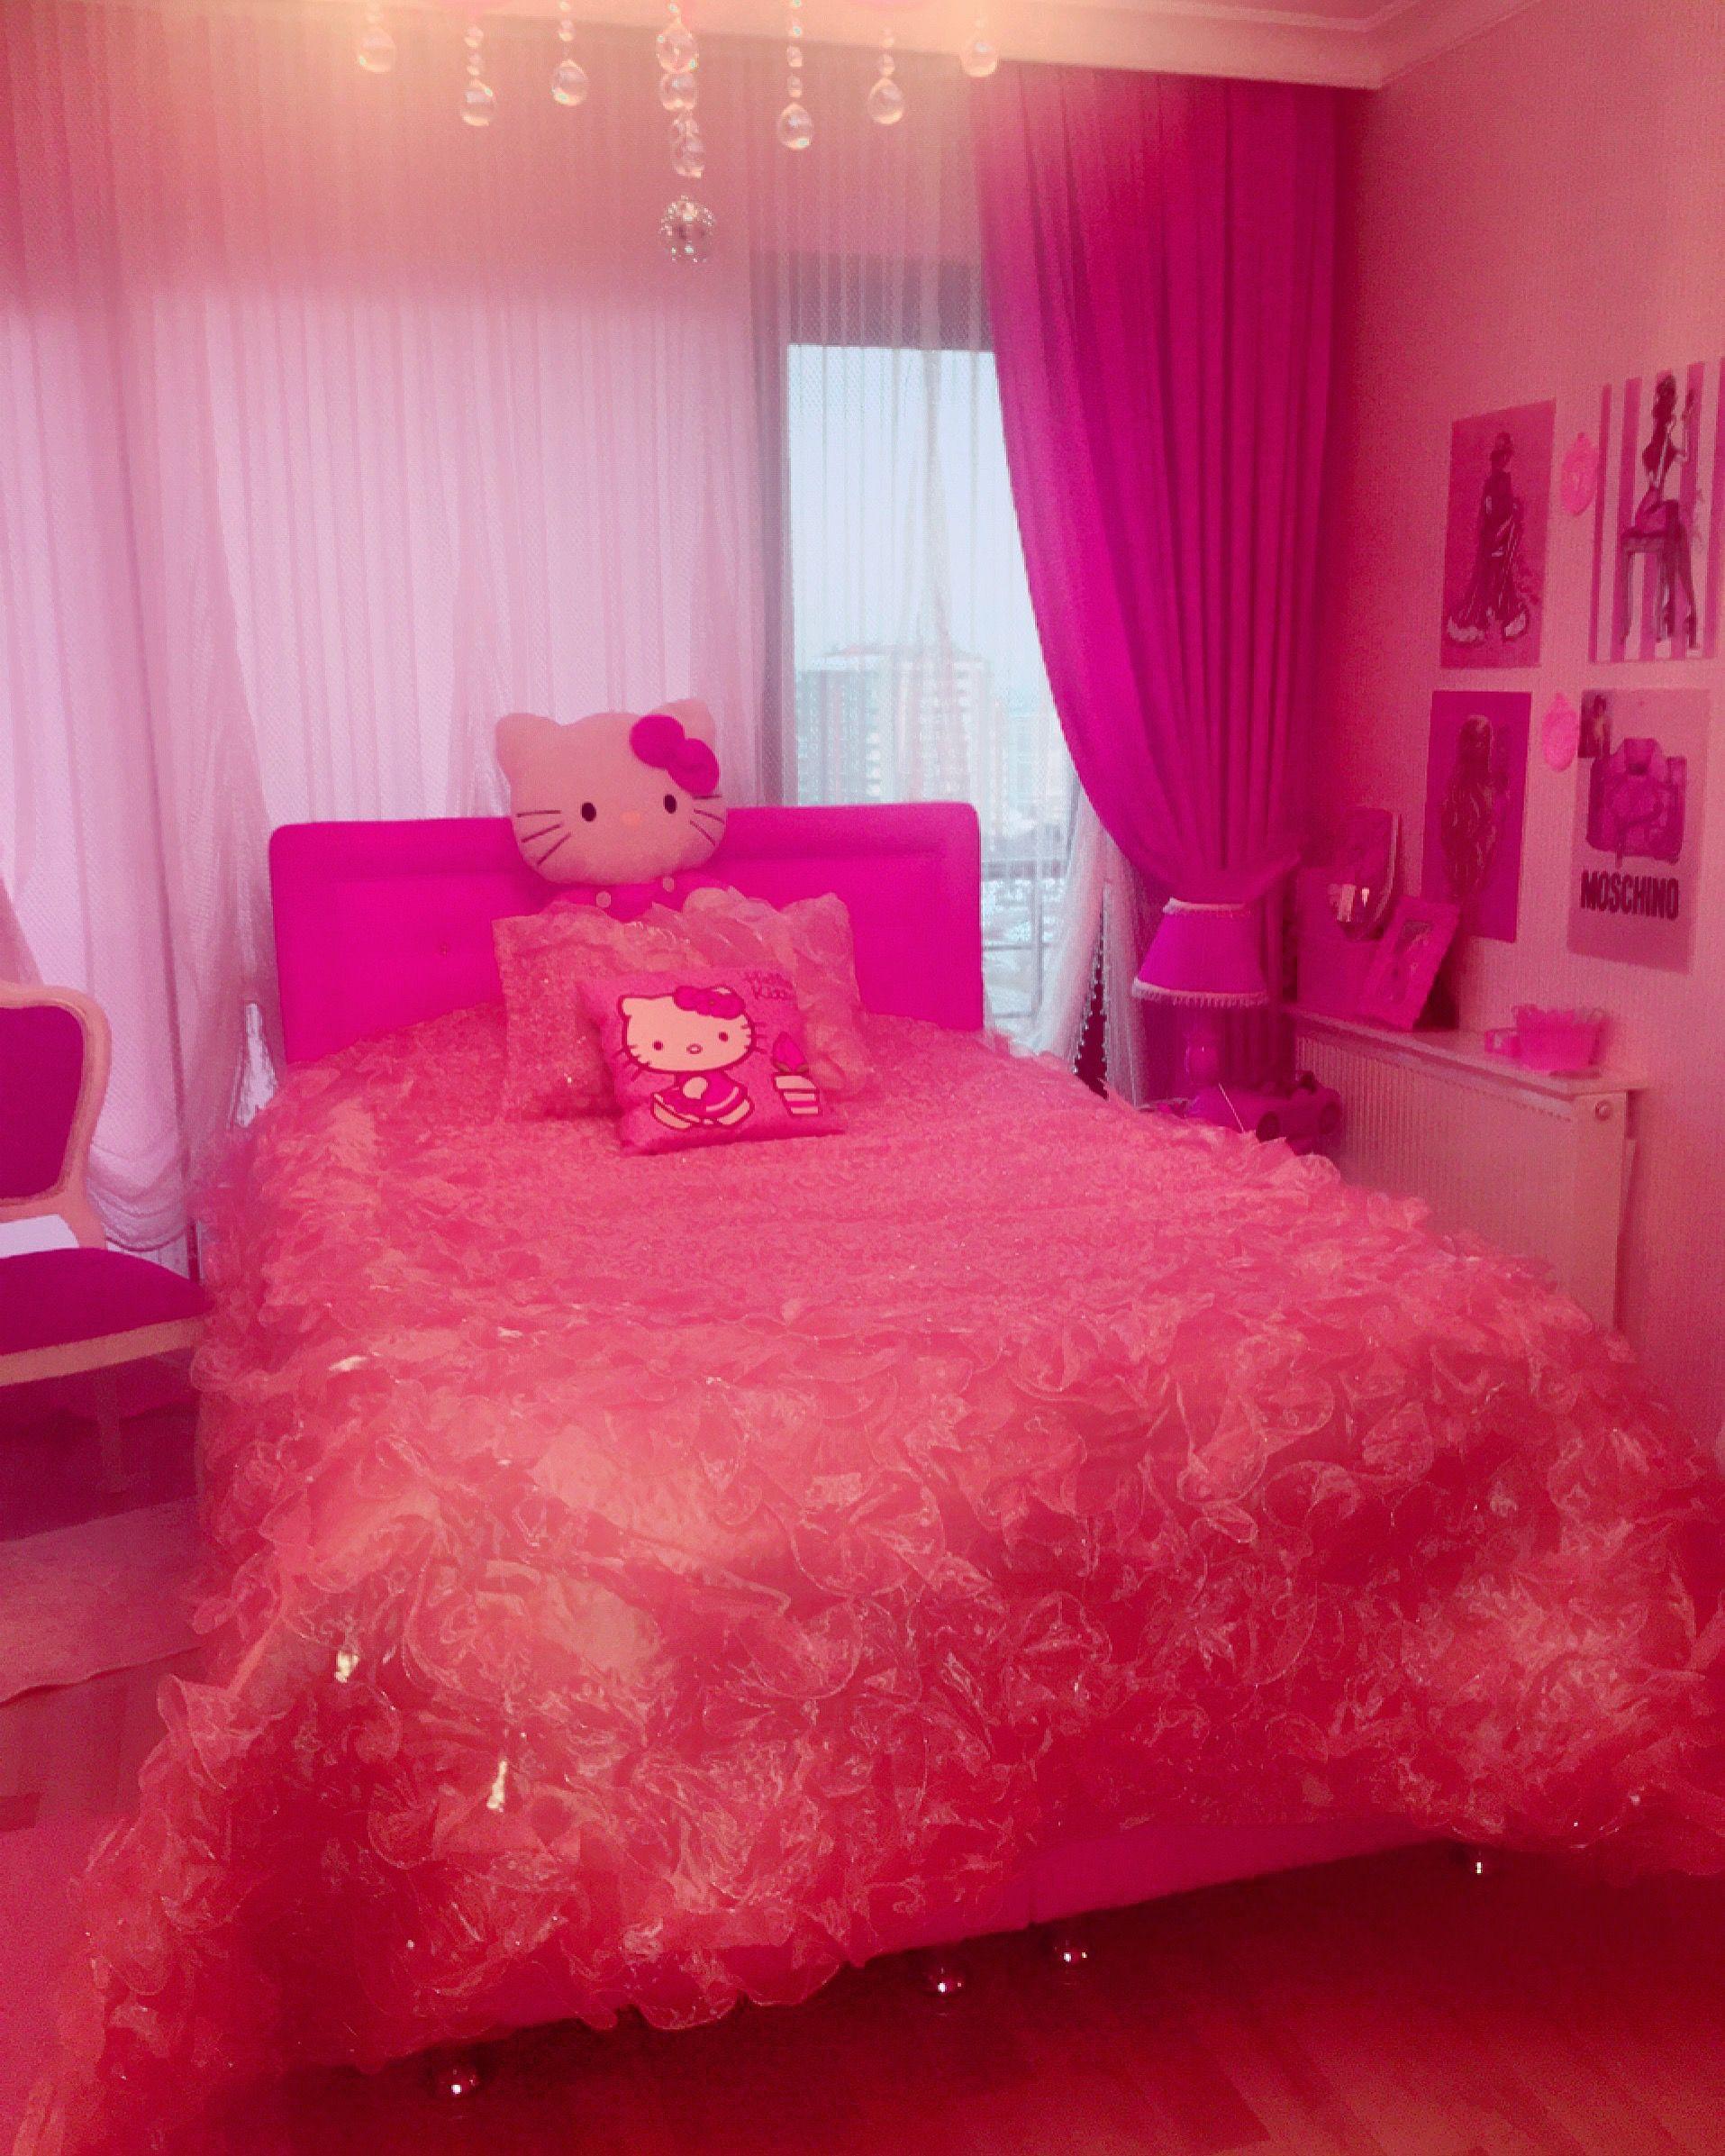 fashiondollshop furniture structure living bedroom dream room acc barbie animals